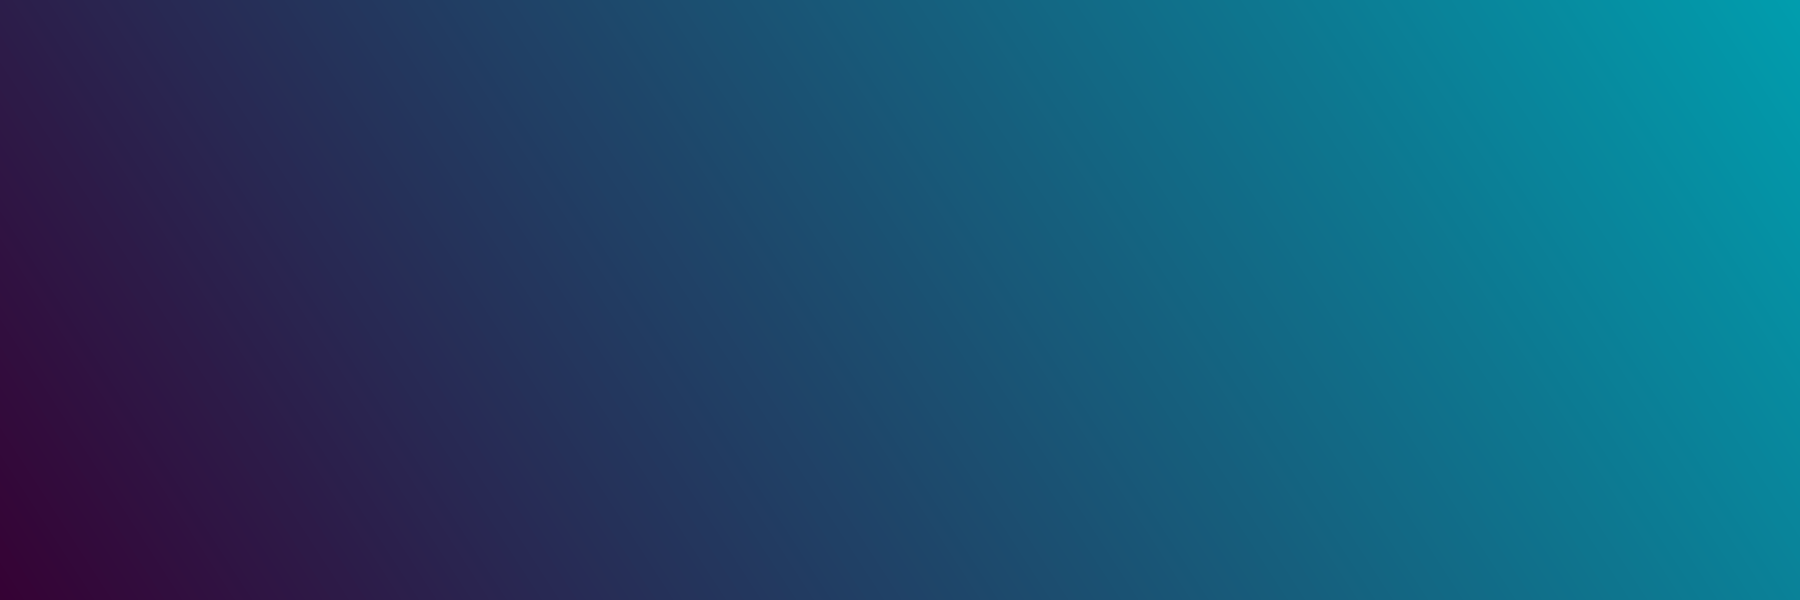 landingpage-header-farbverlauf-morpheus